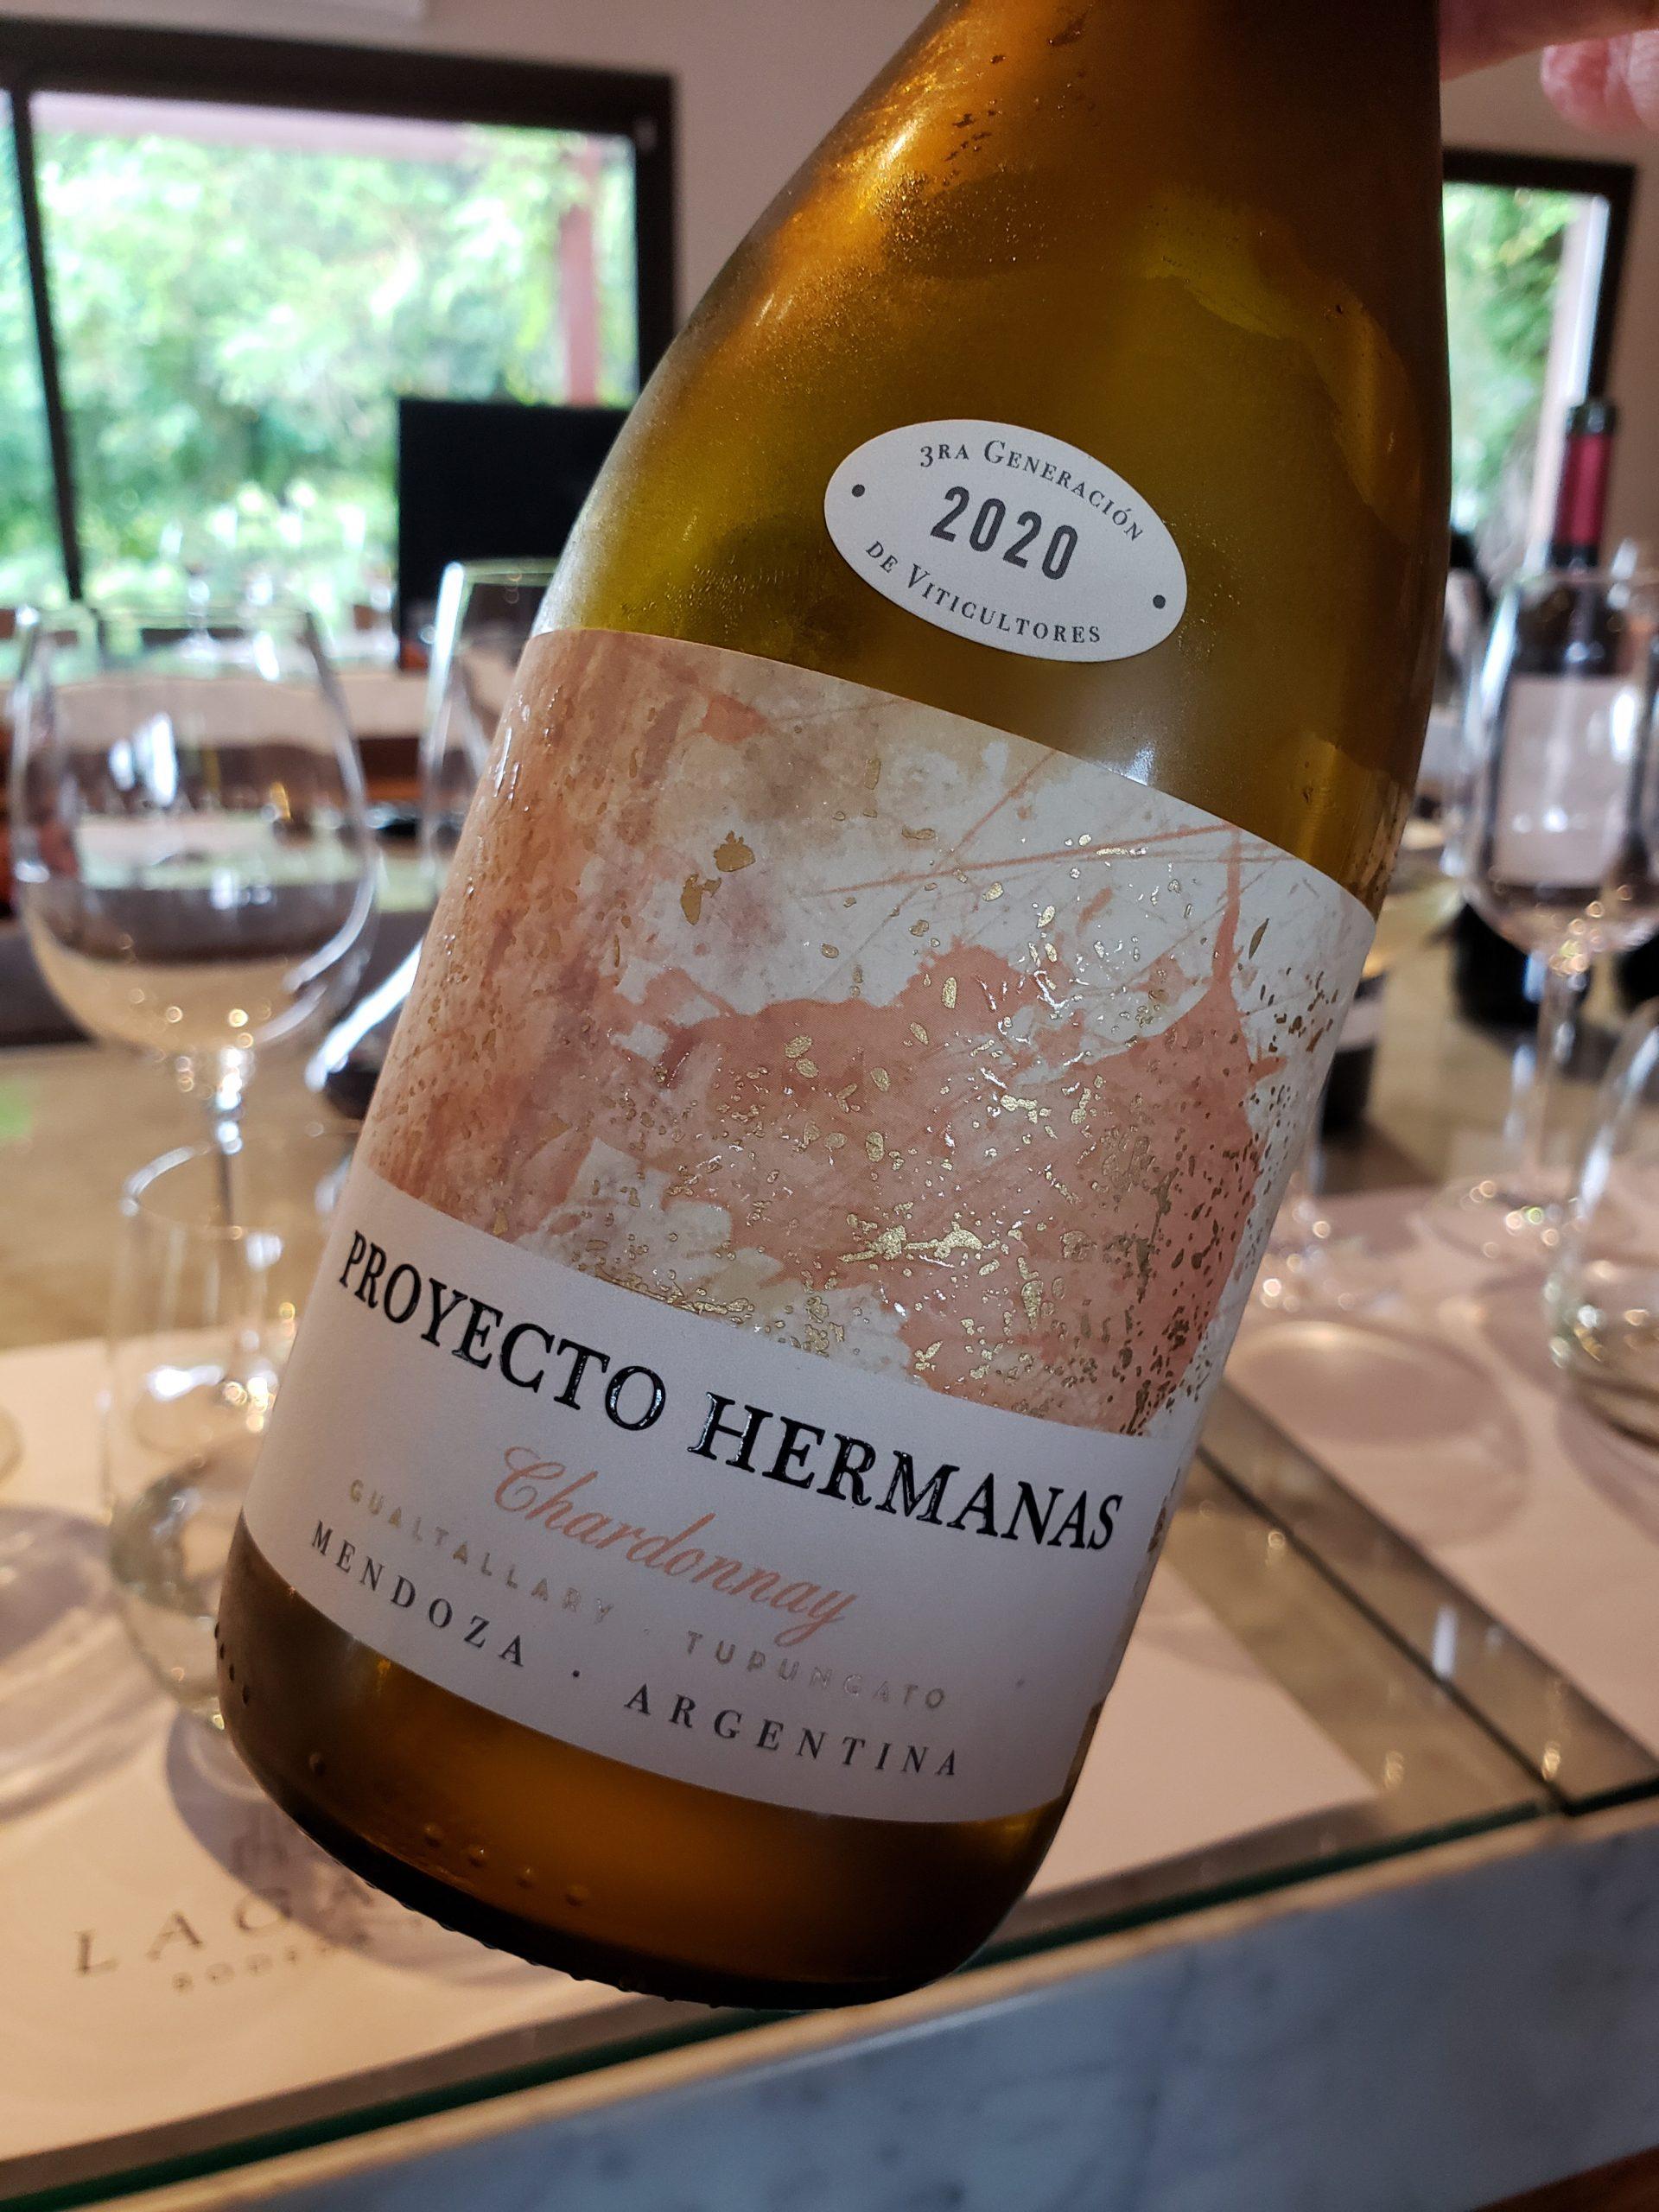 Bodega Lagarde - Proyecto Hermanas Chardonnay 2020